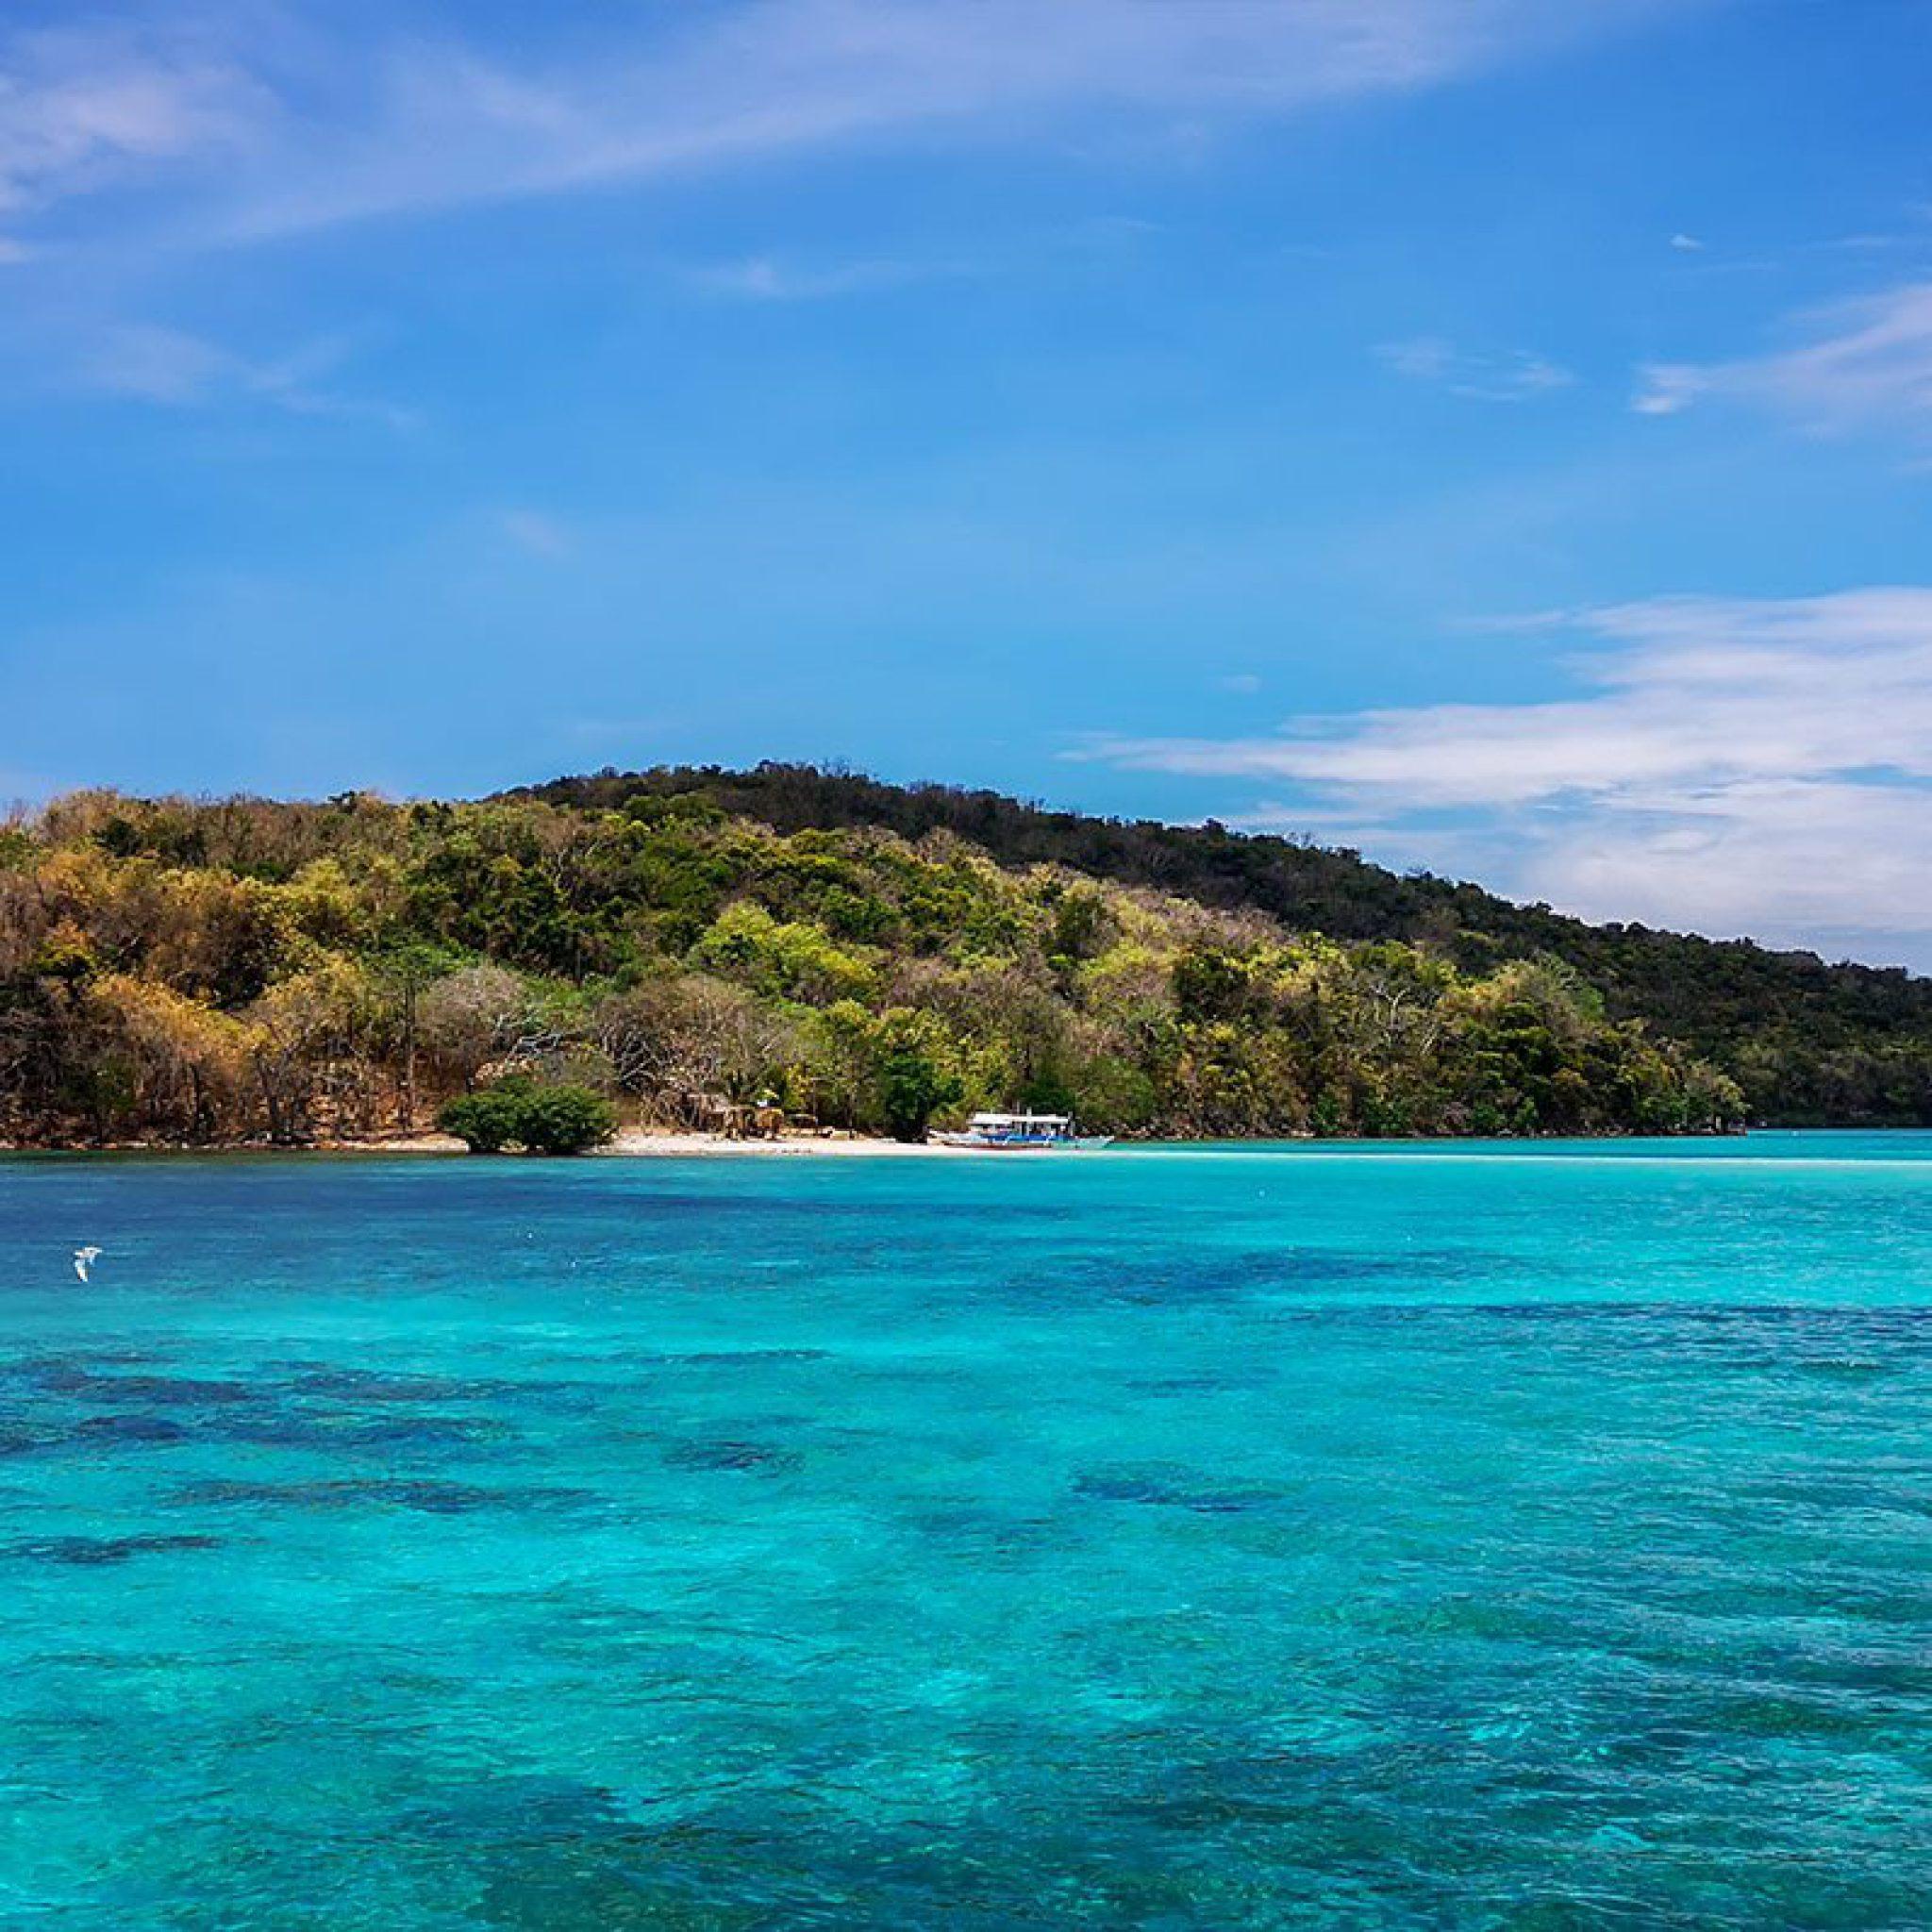 Linapacan Archipelago